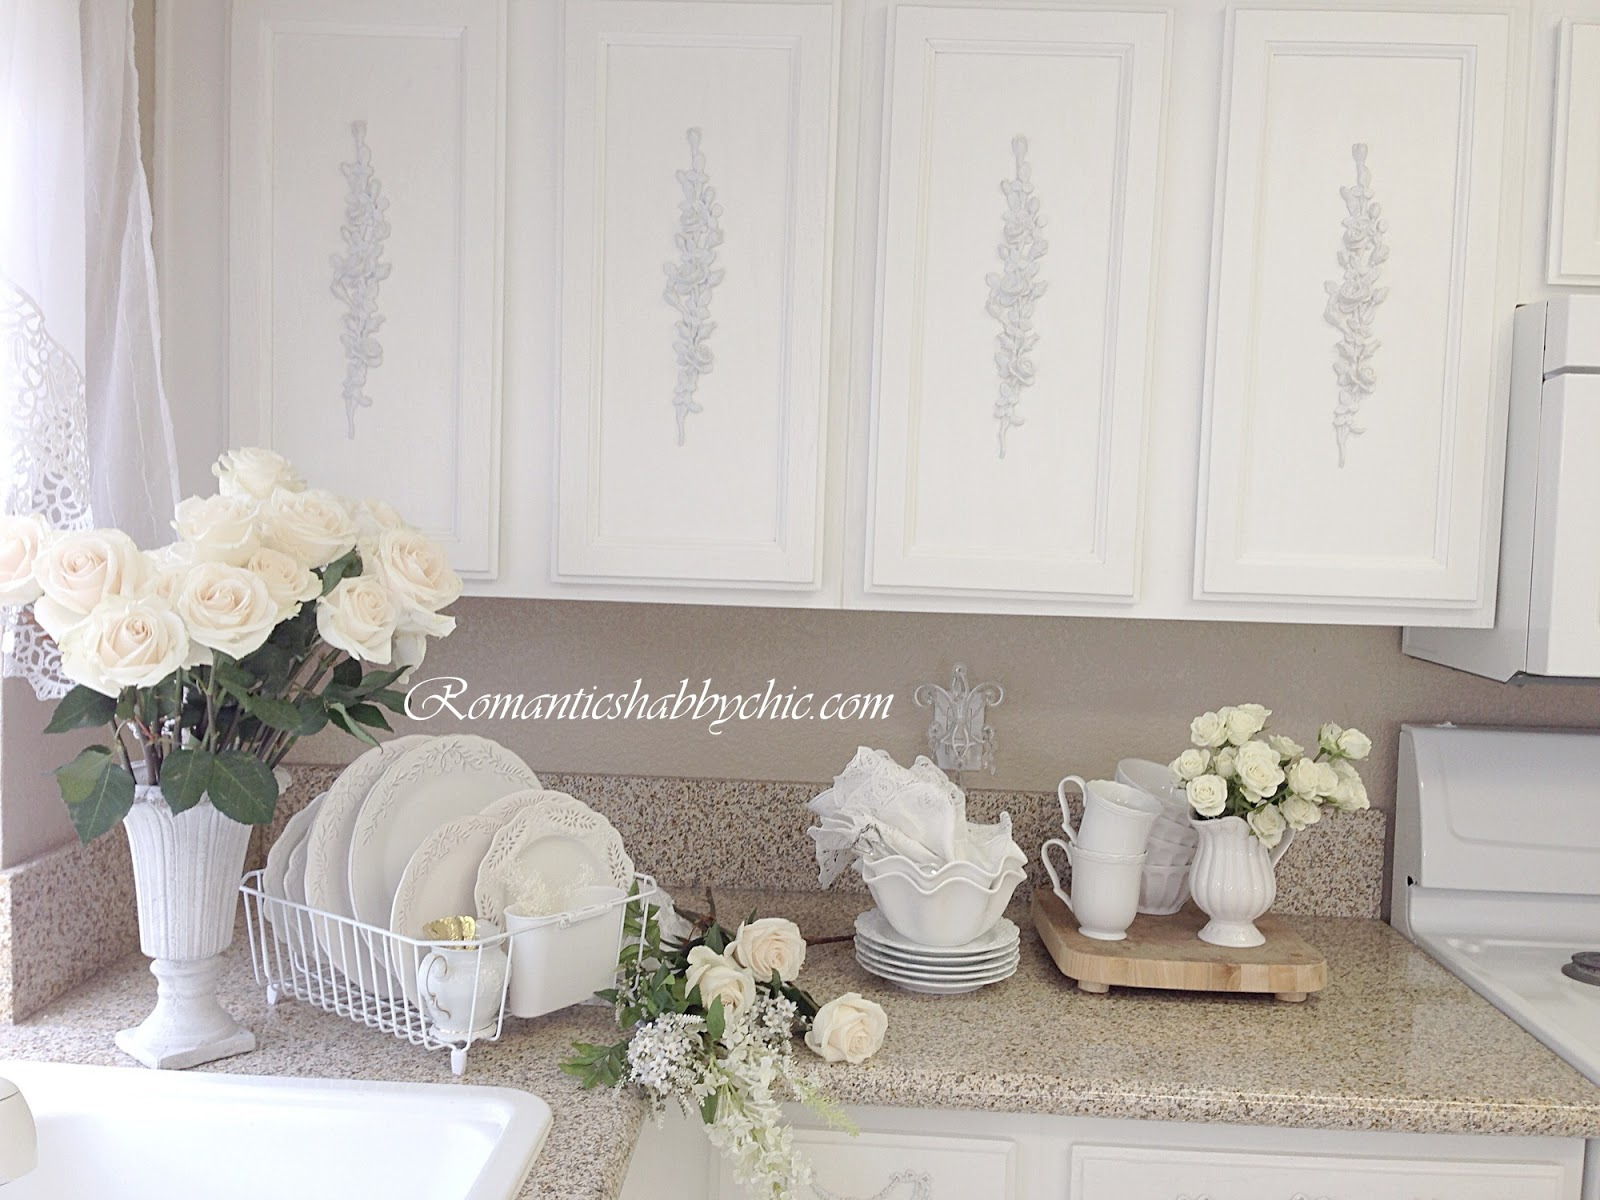 shabby chic kitchen decor cabinets images romantic home romanticshabbychic com